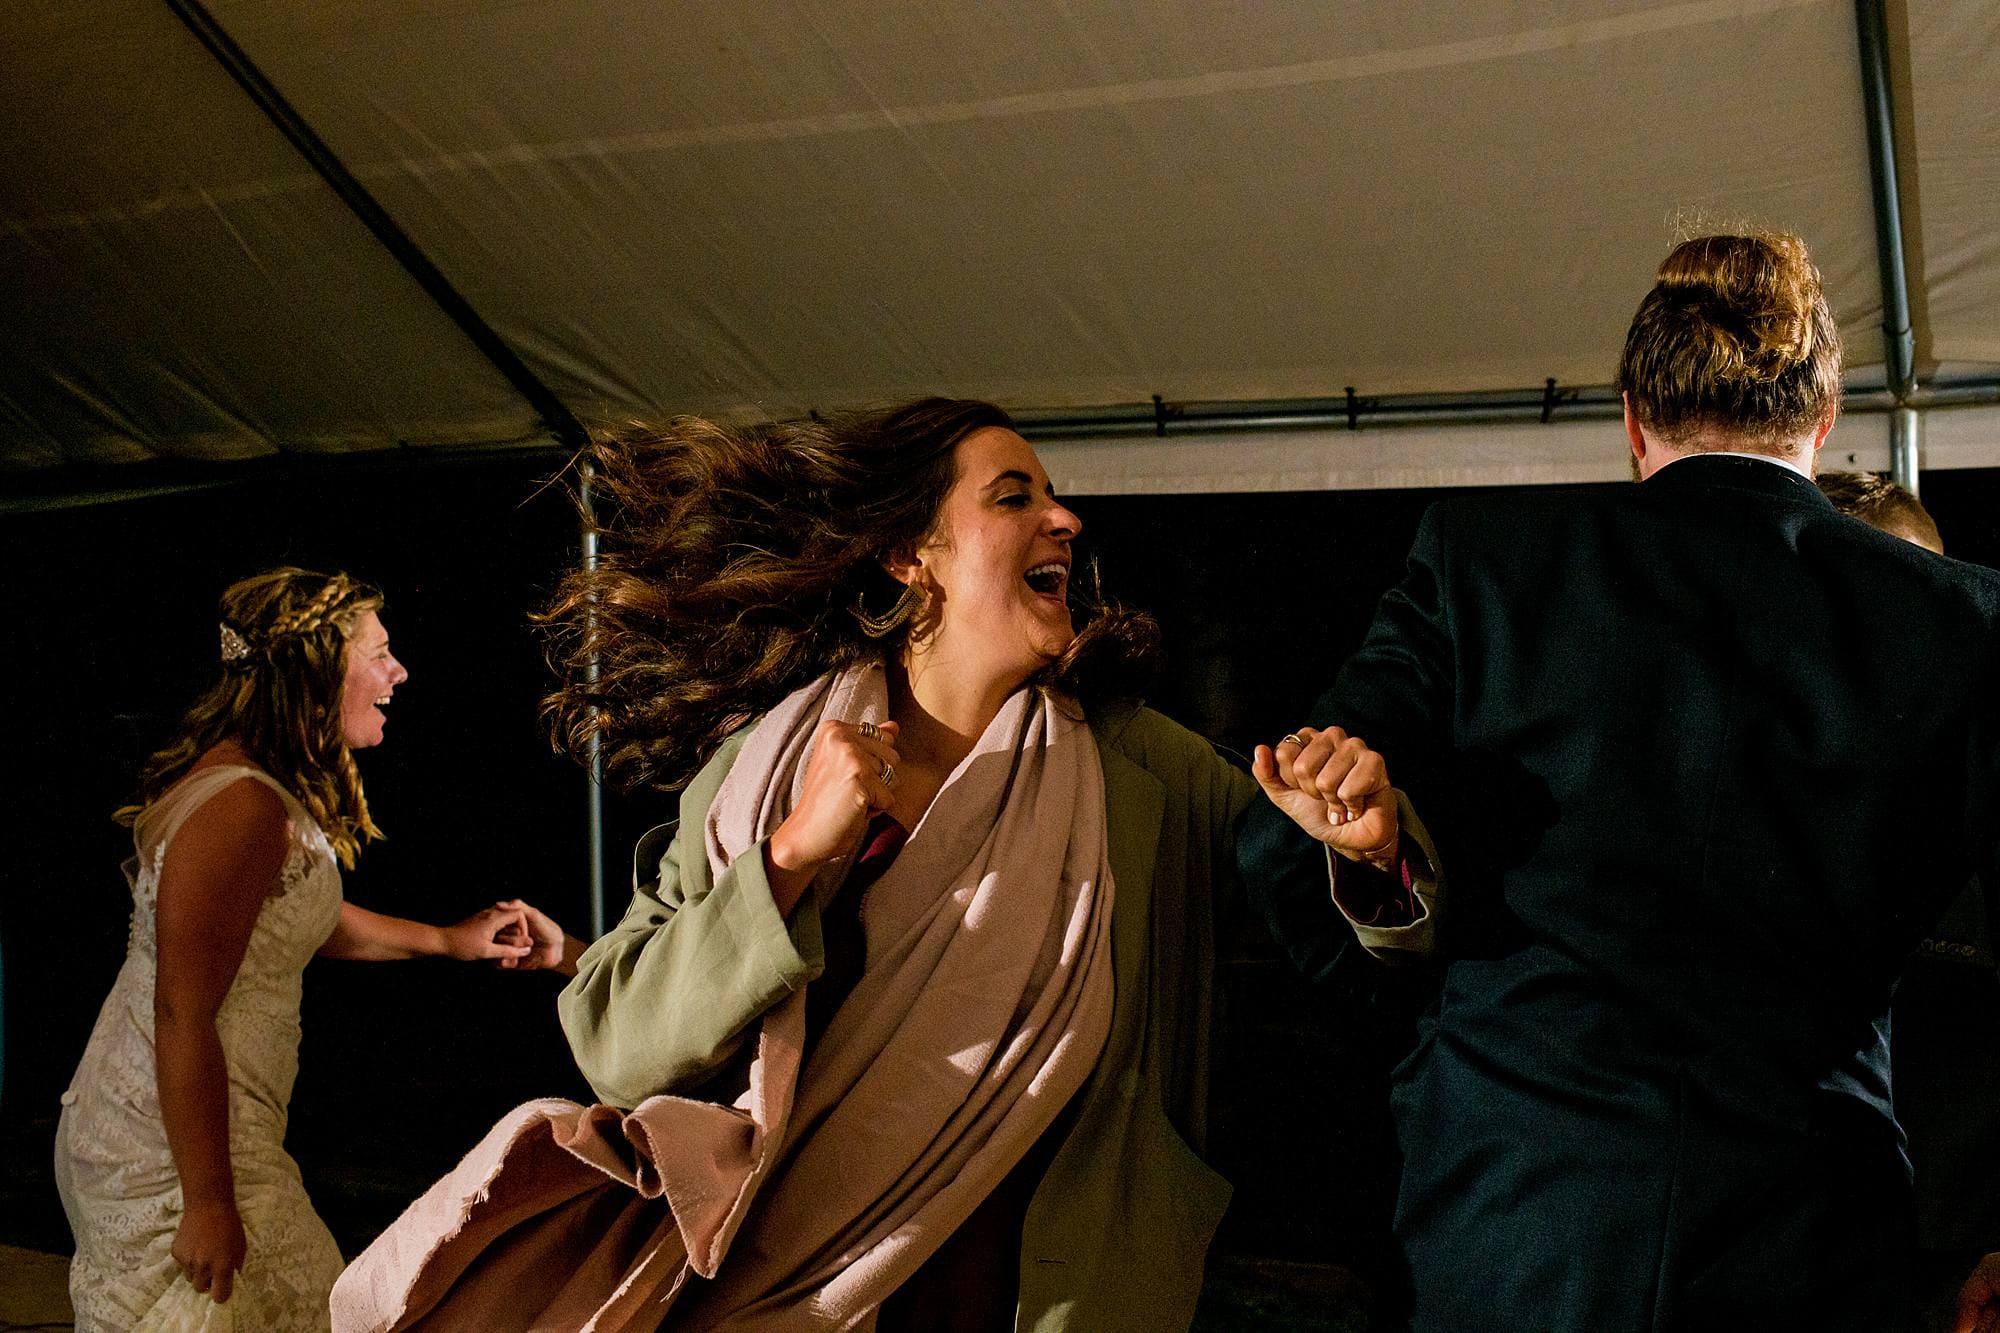 dancing to who hit john at west michigan wedding reception